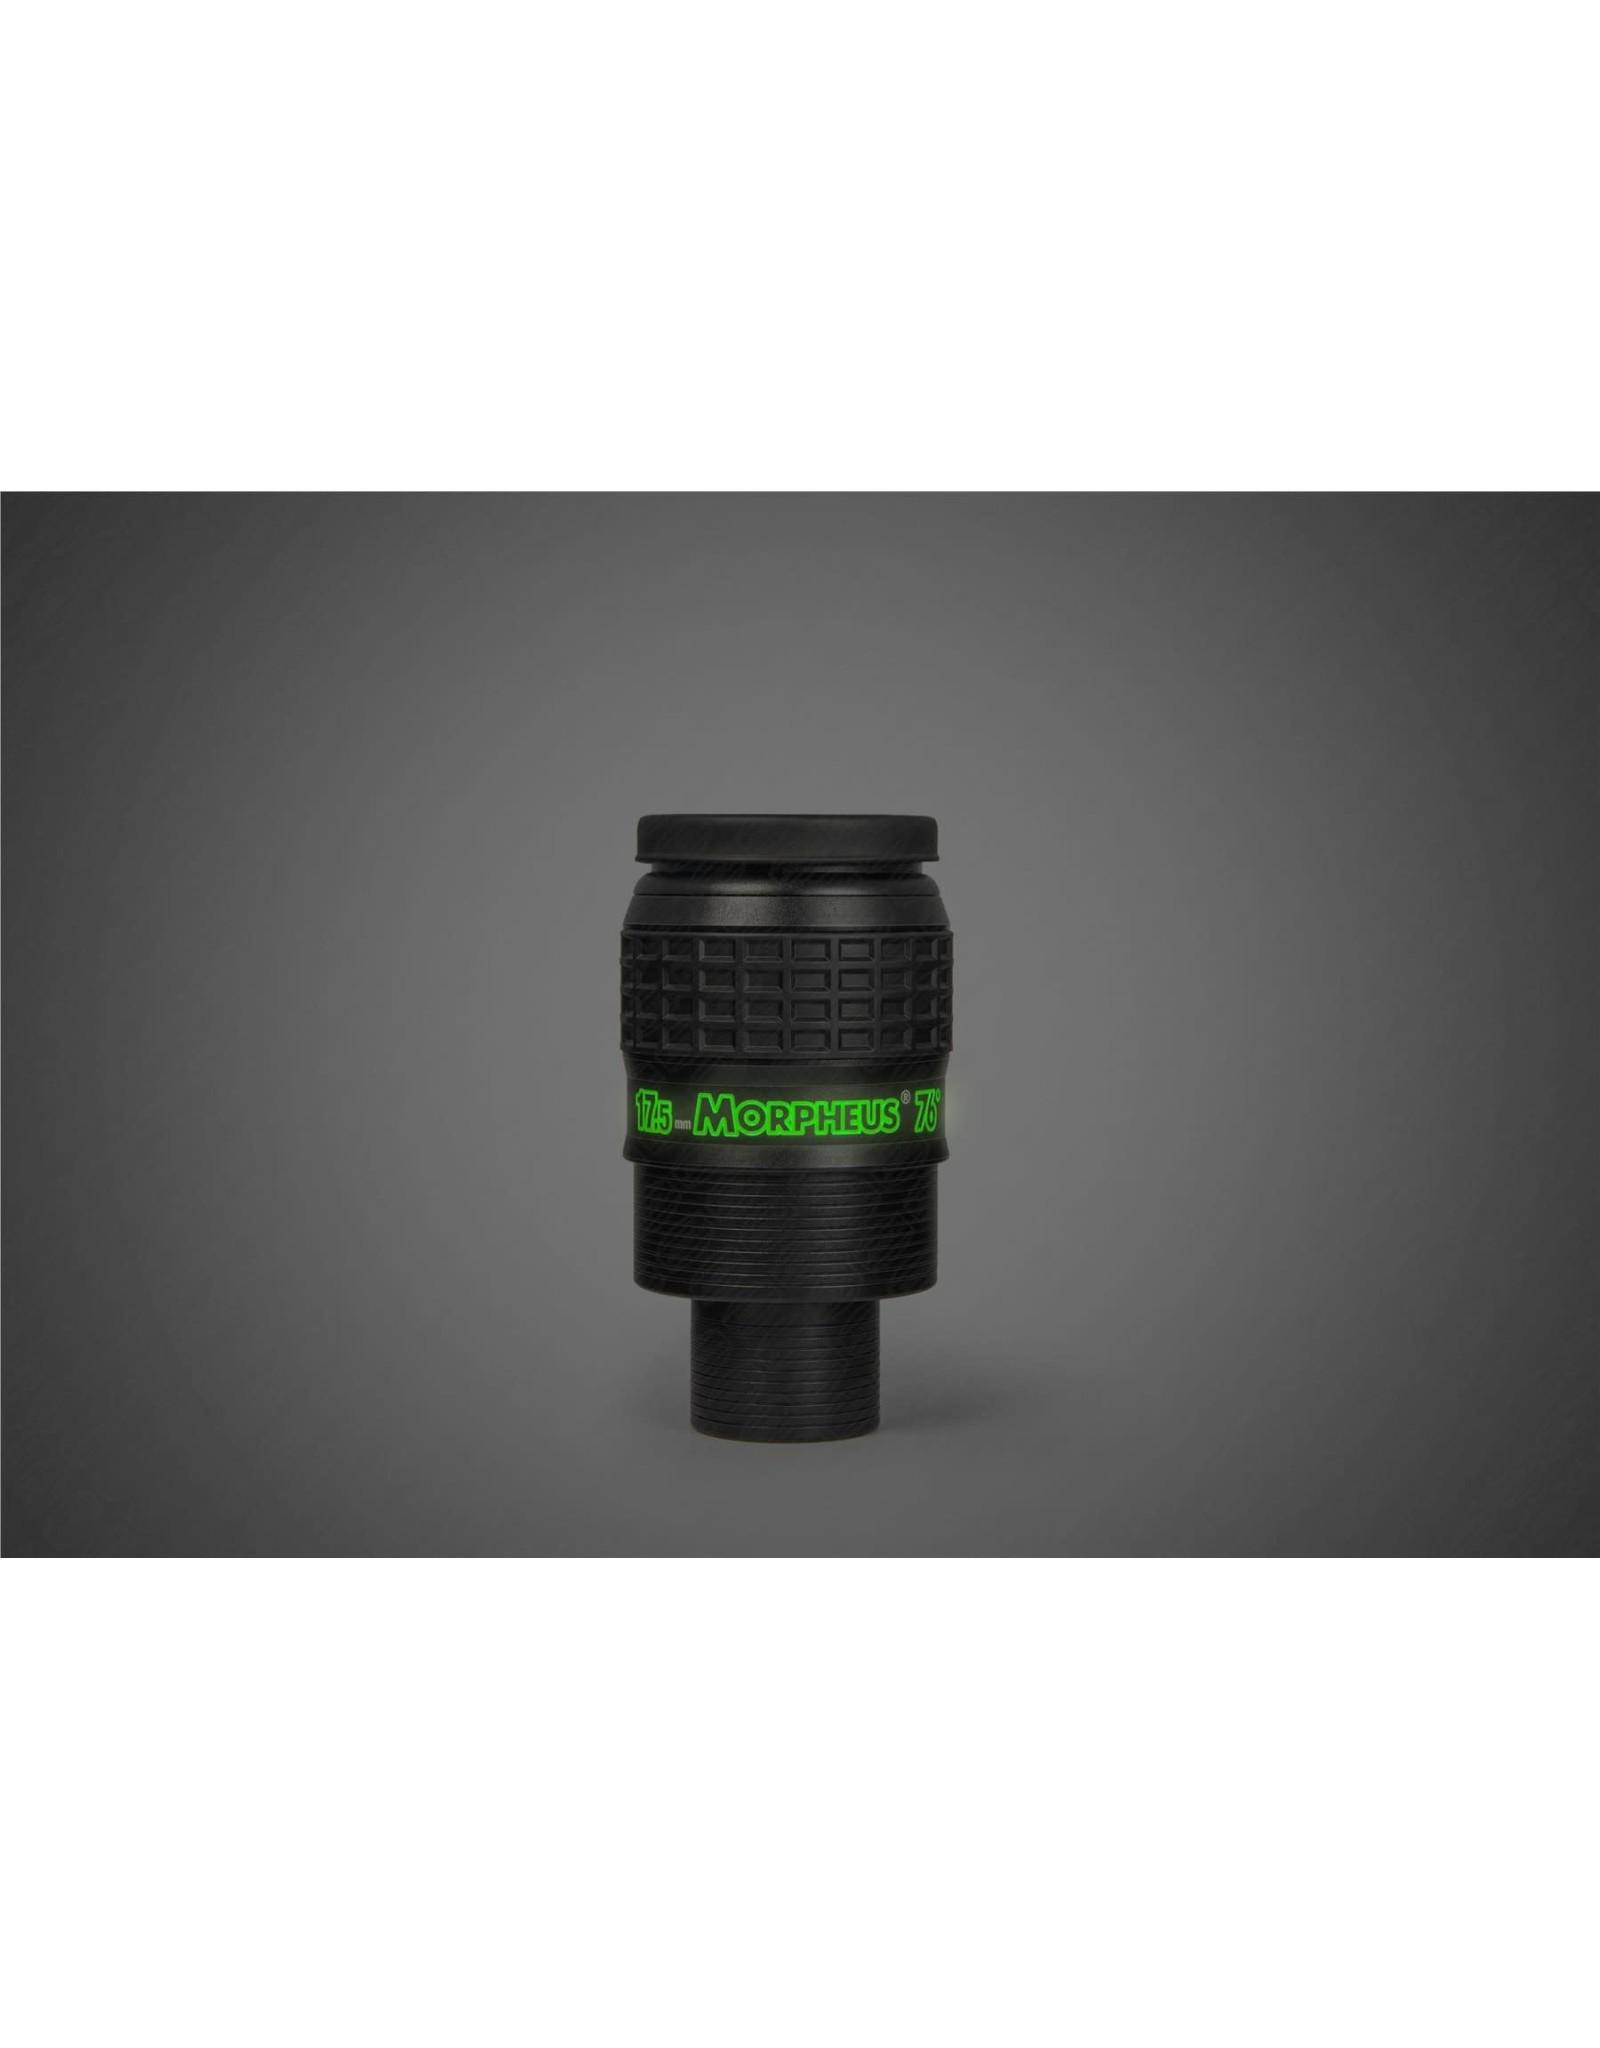 Baader Planetarium Baader Morpheus 76deg Eyepiece 17.5mm